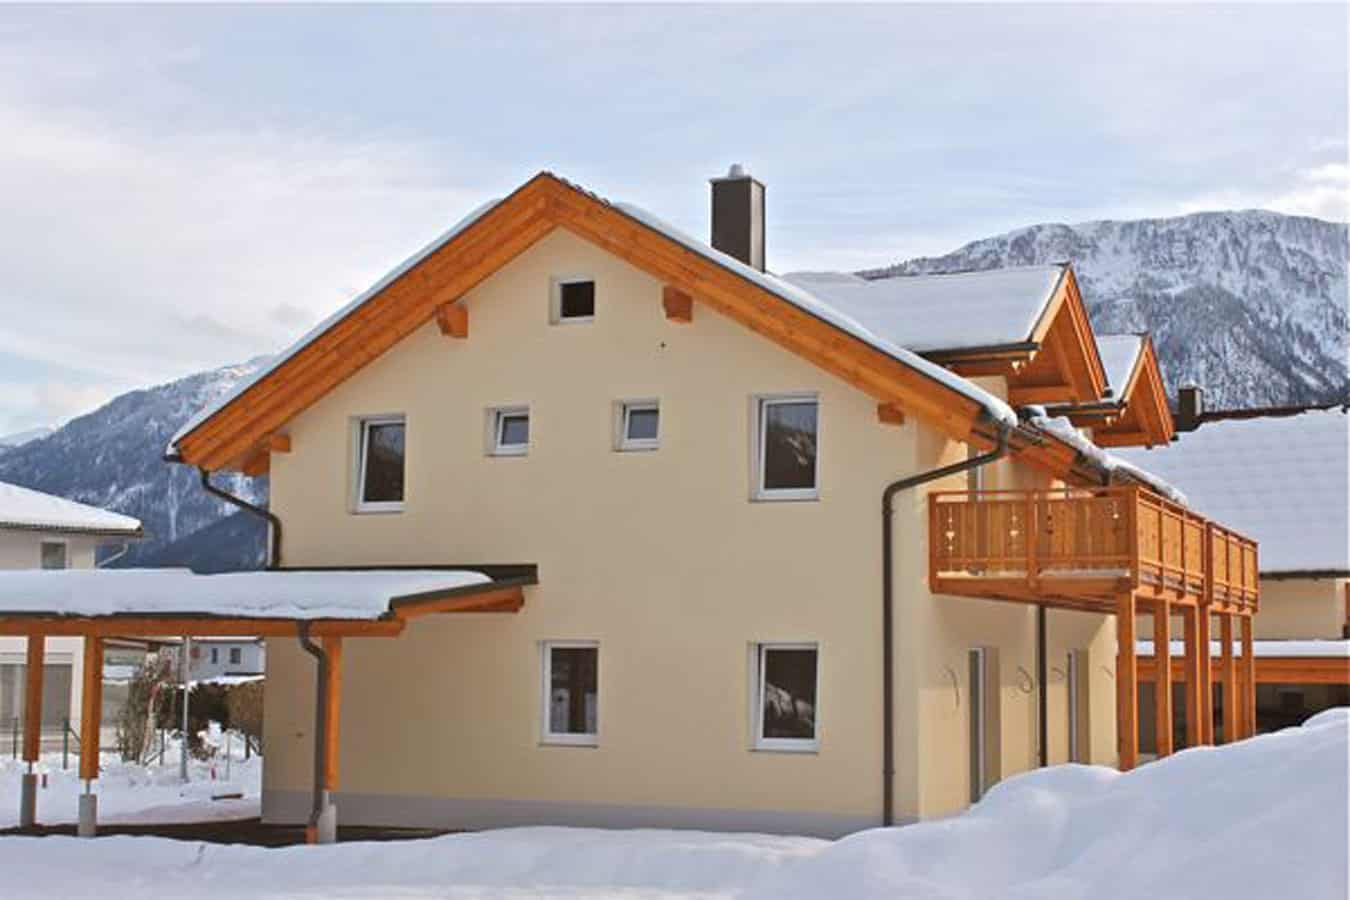 villa-suzanne-impressie-2-villa-exterieur-2-kwo-villa